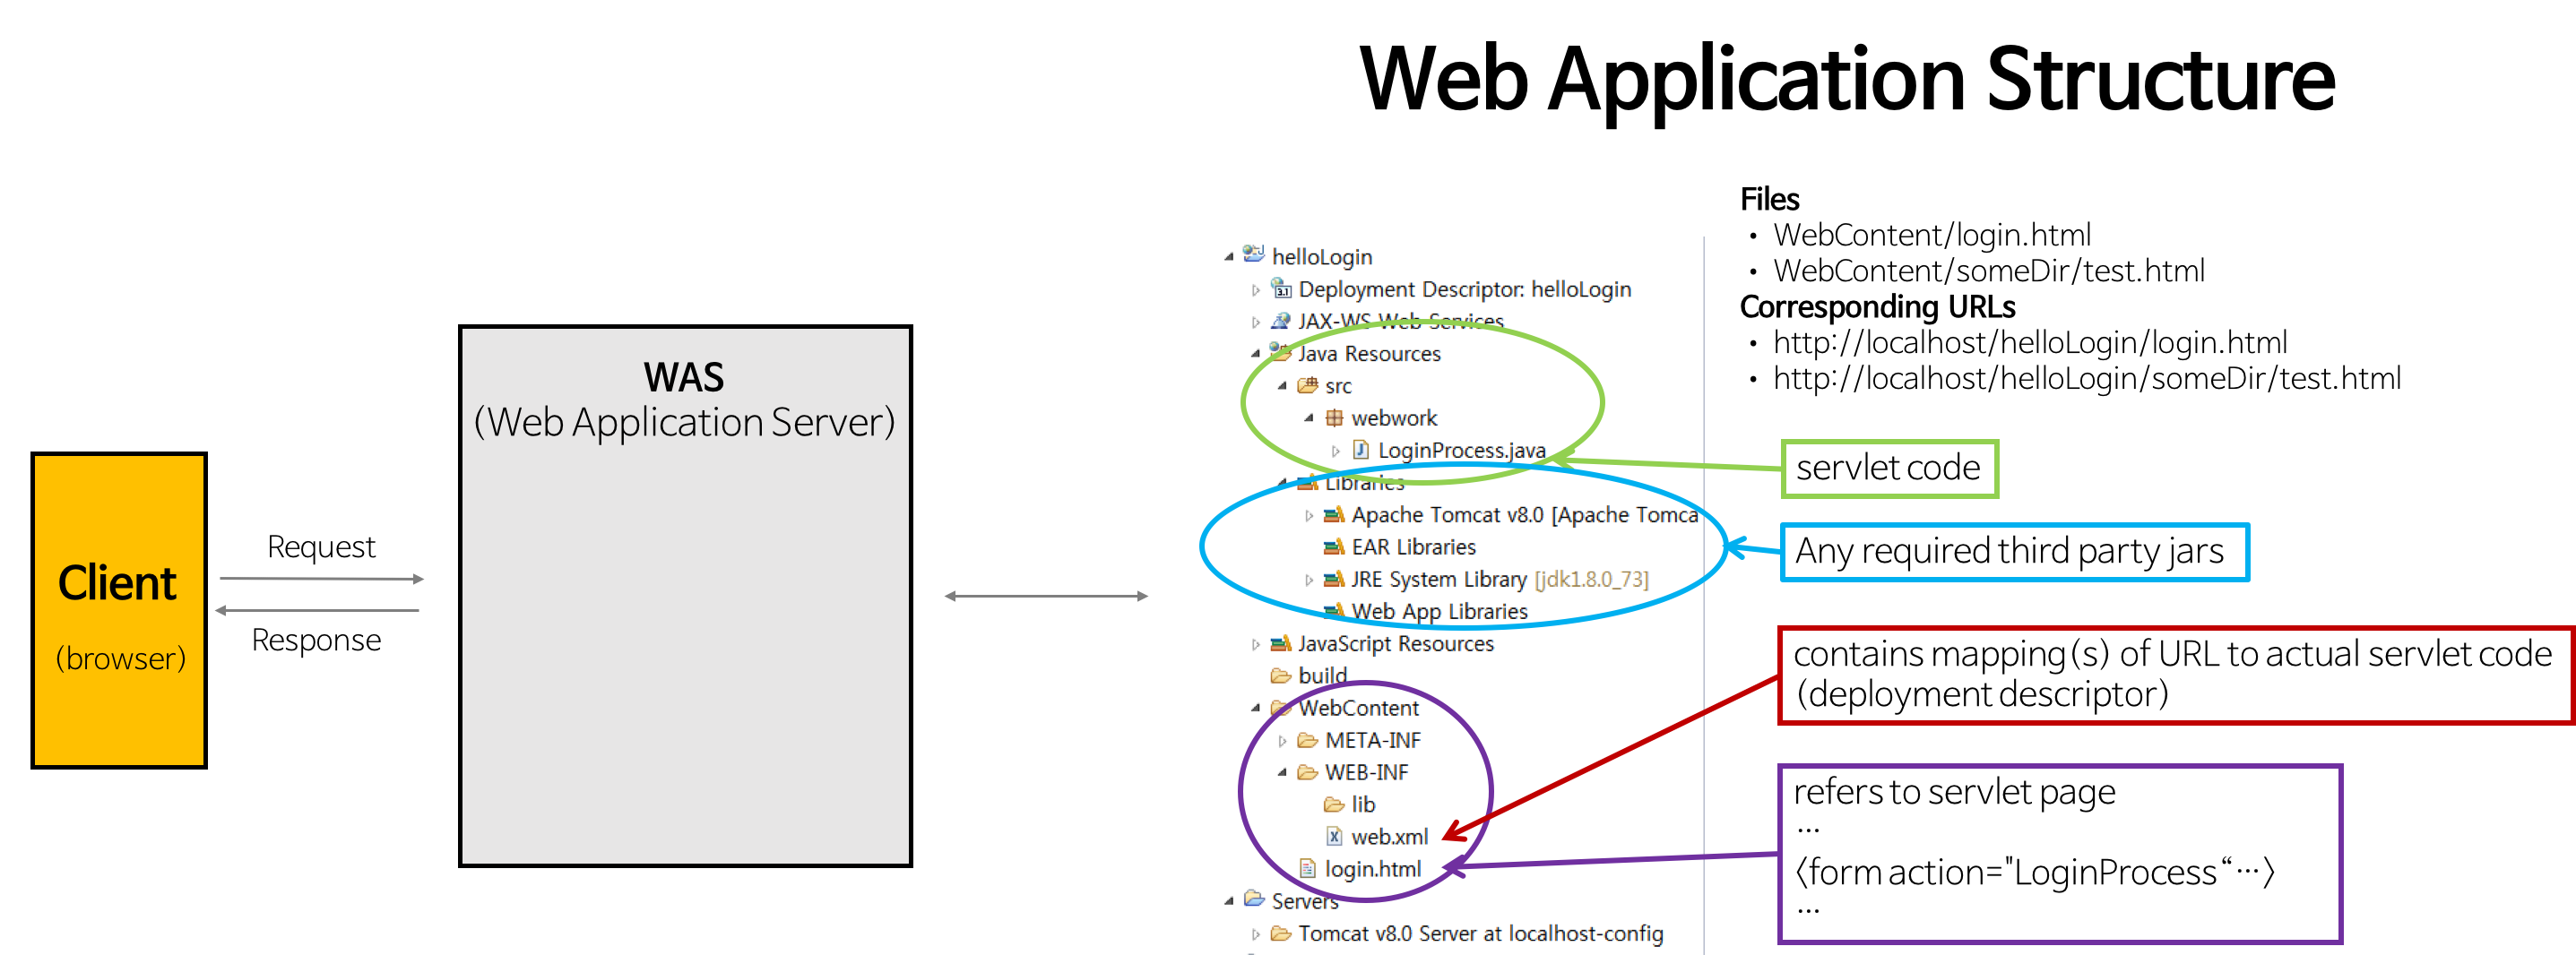 Web] web xml 설정 내용, 역할 및 간단한 예시 이해하기